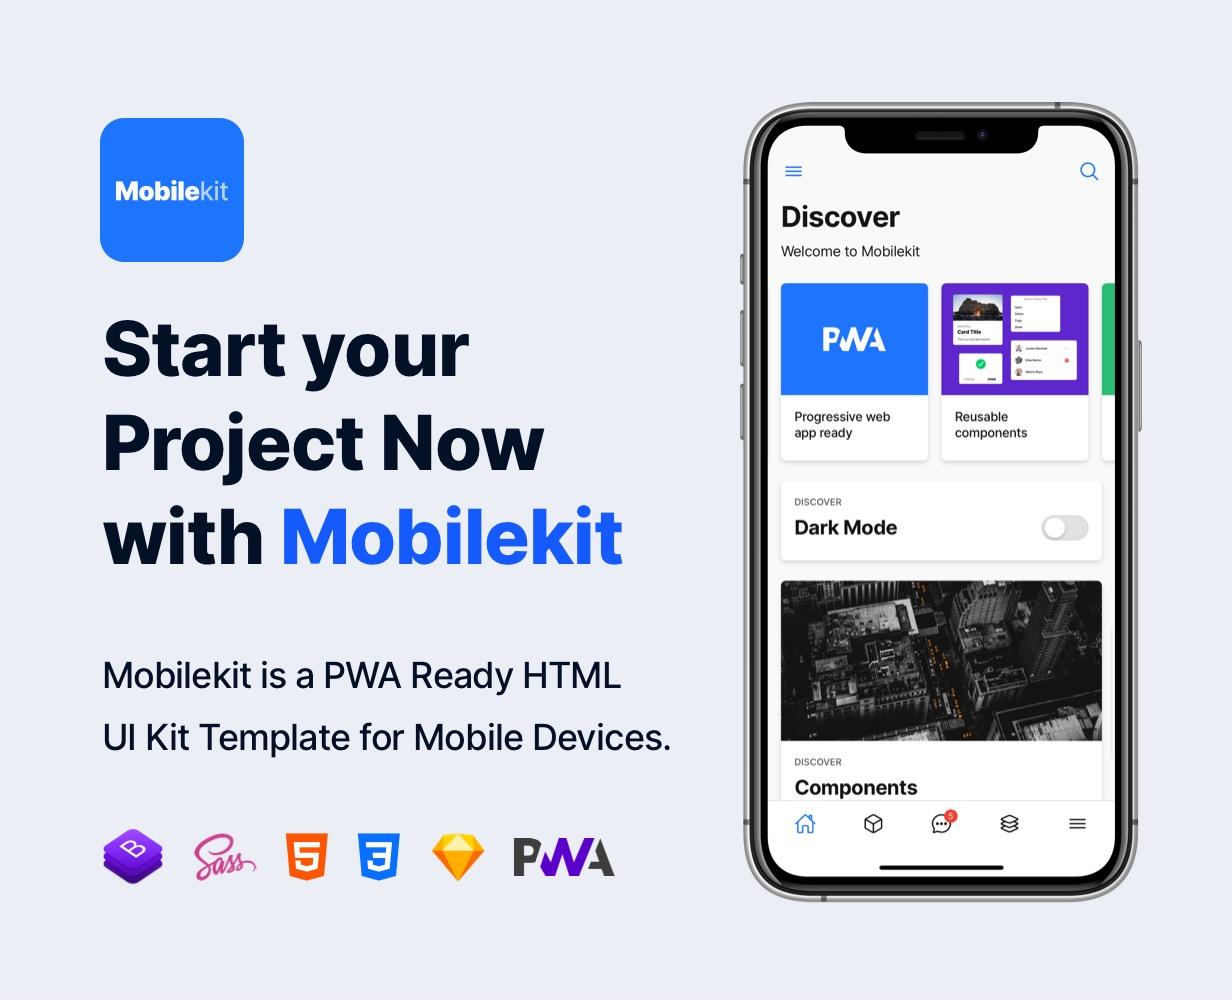 pwa template - Mobilekit - Bootstrap 4 Based HTML Template